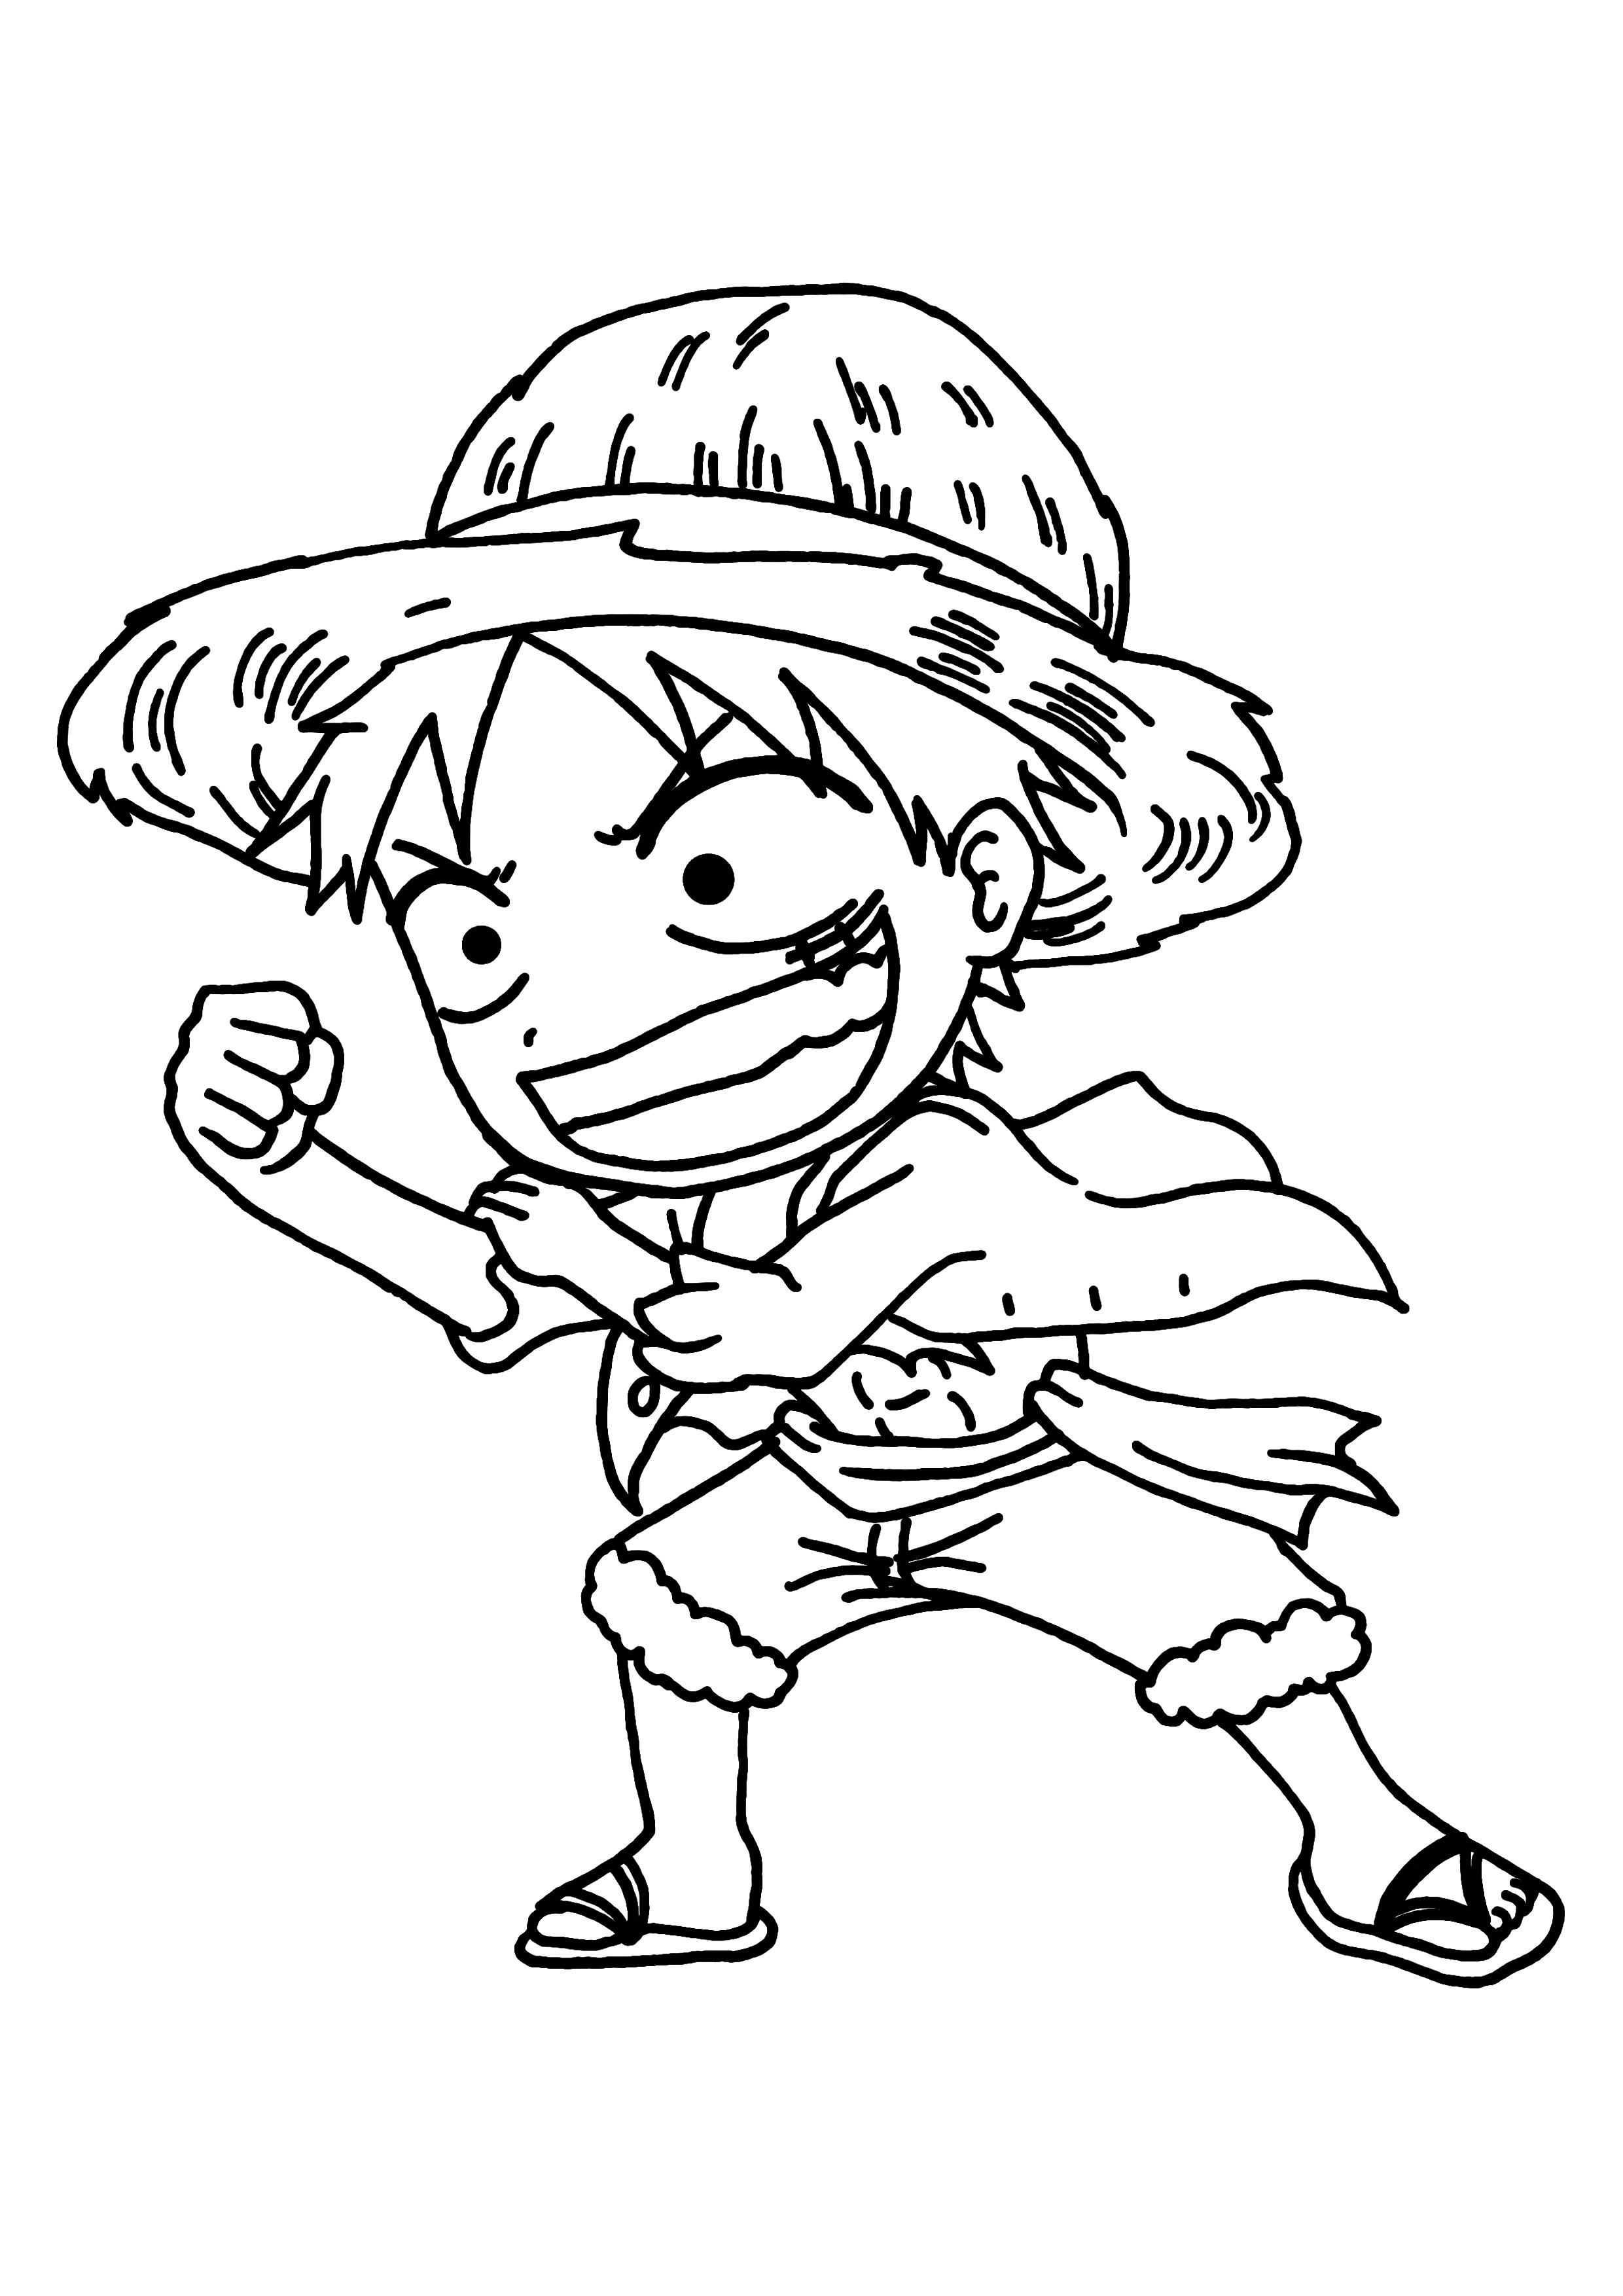 Coloriage One Piece À Colorier Dessin À Imprimer | Dab Dessin concernant Manga Dessin A Imprimer